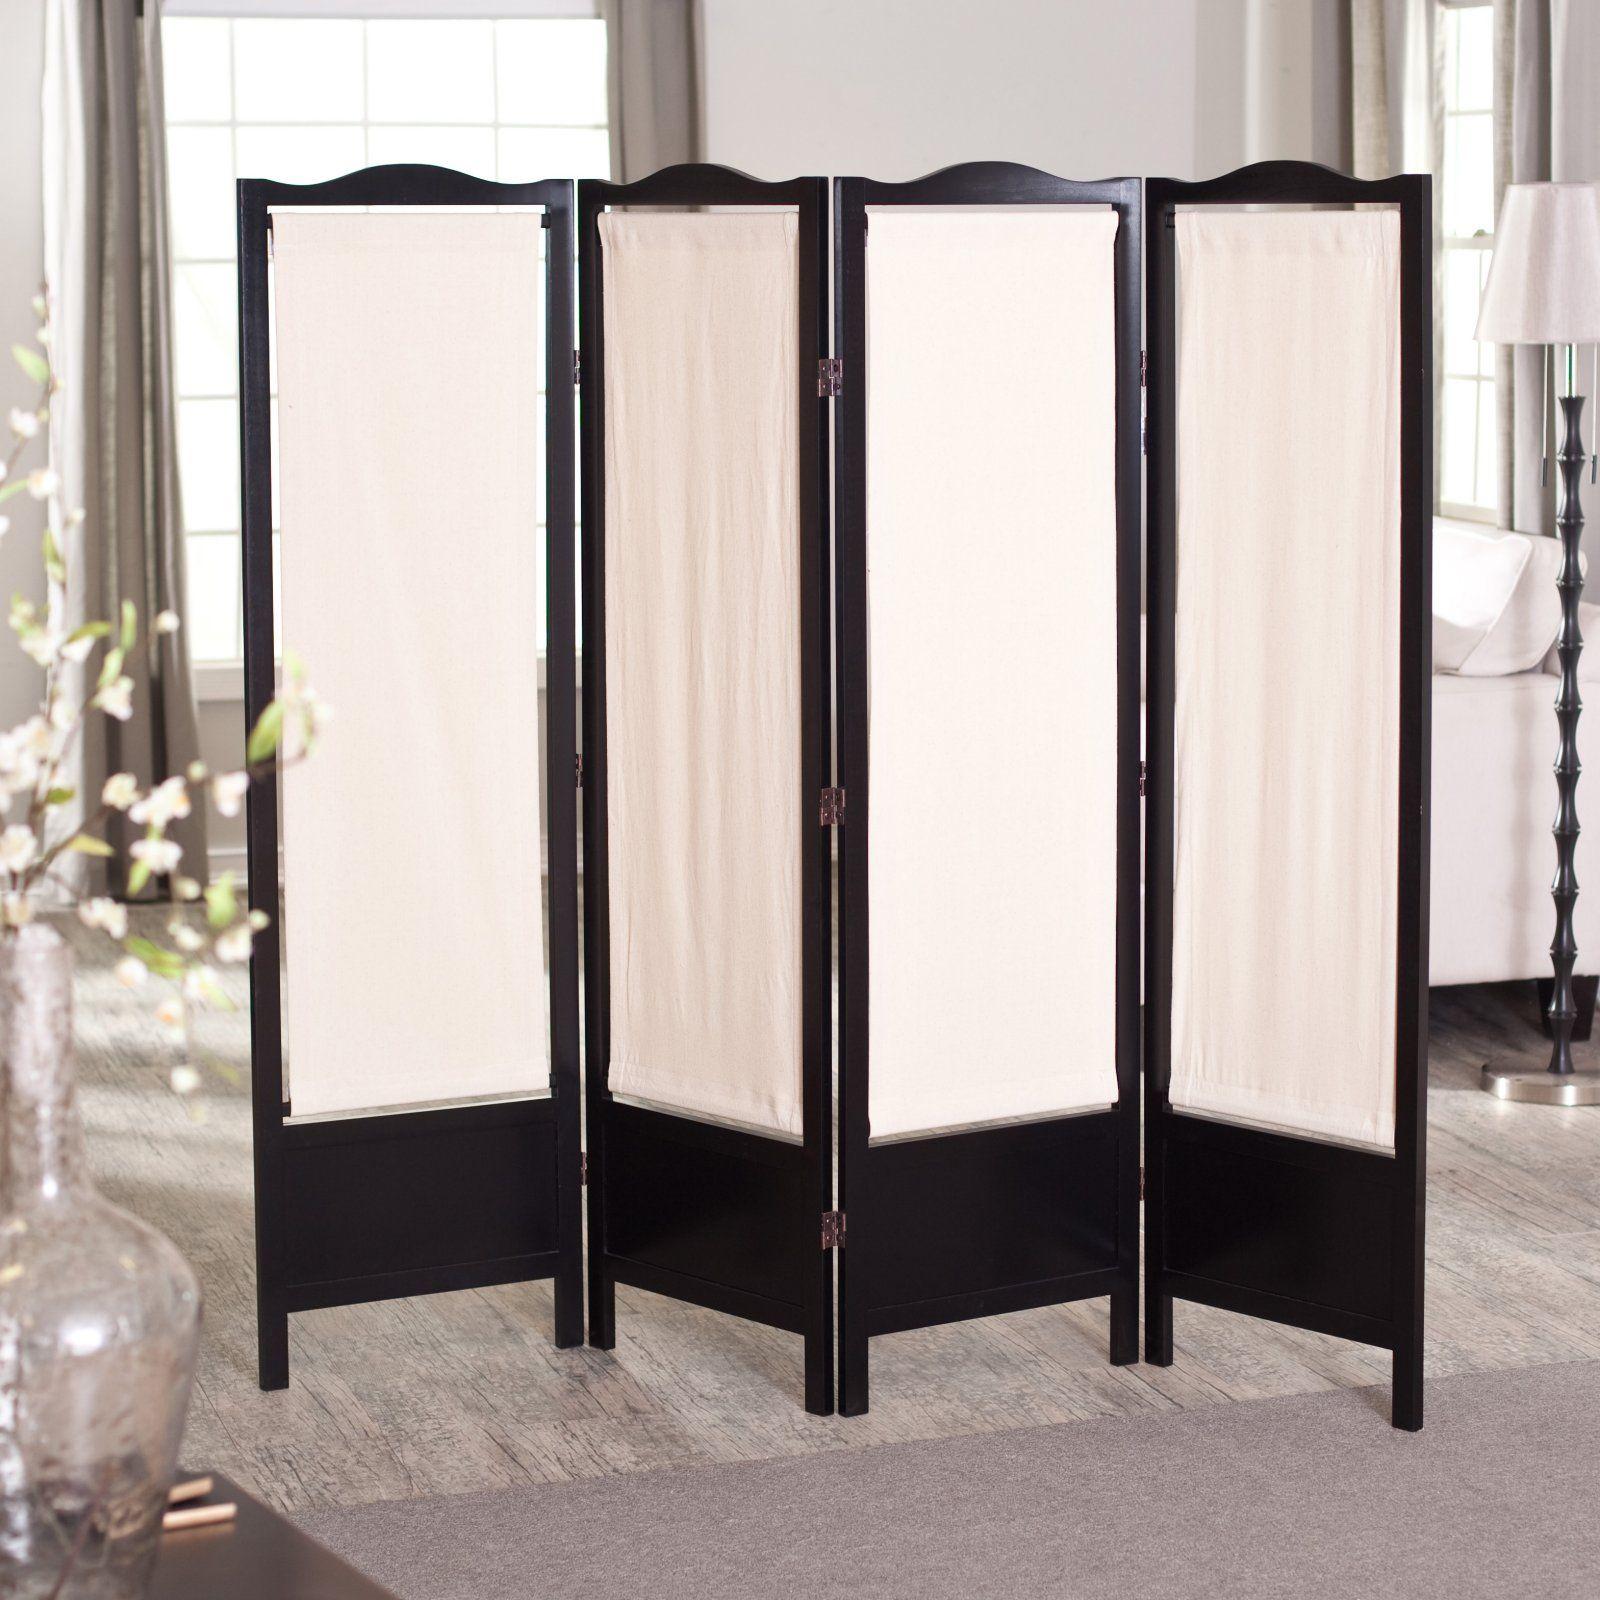 Bedroom divider screens pinterest room panel room divider and